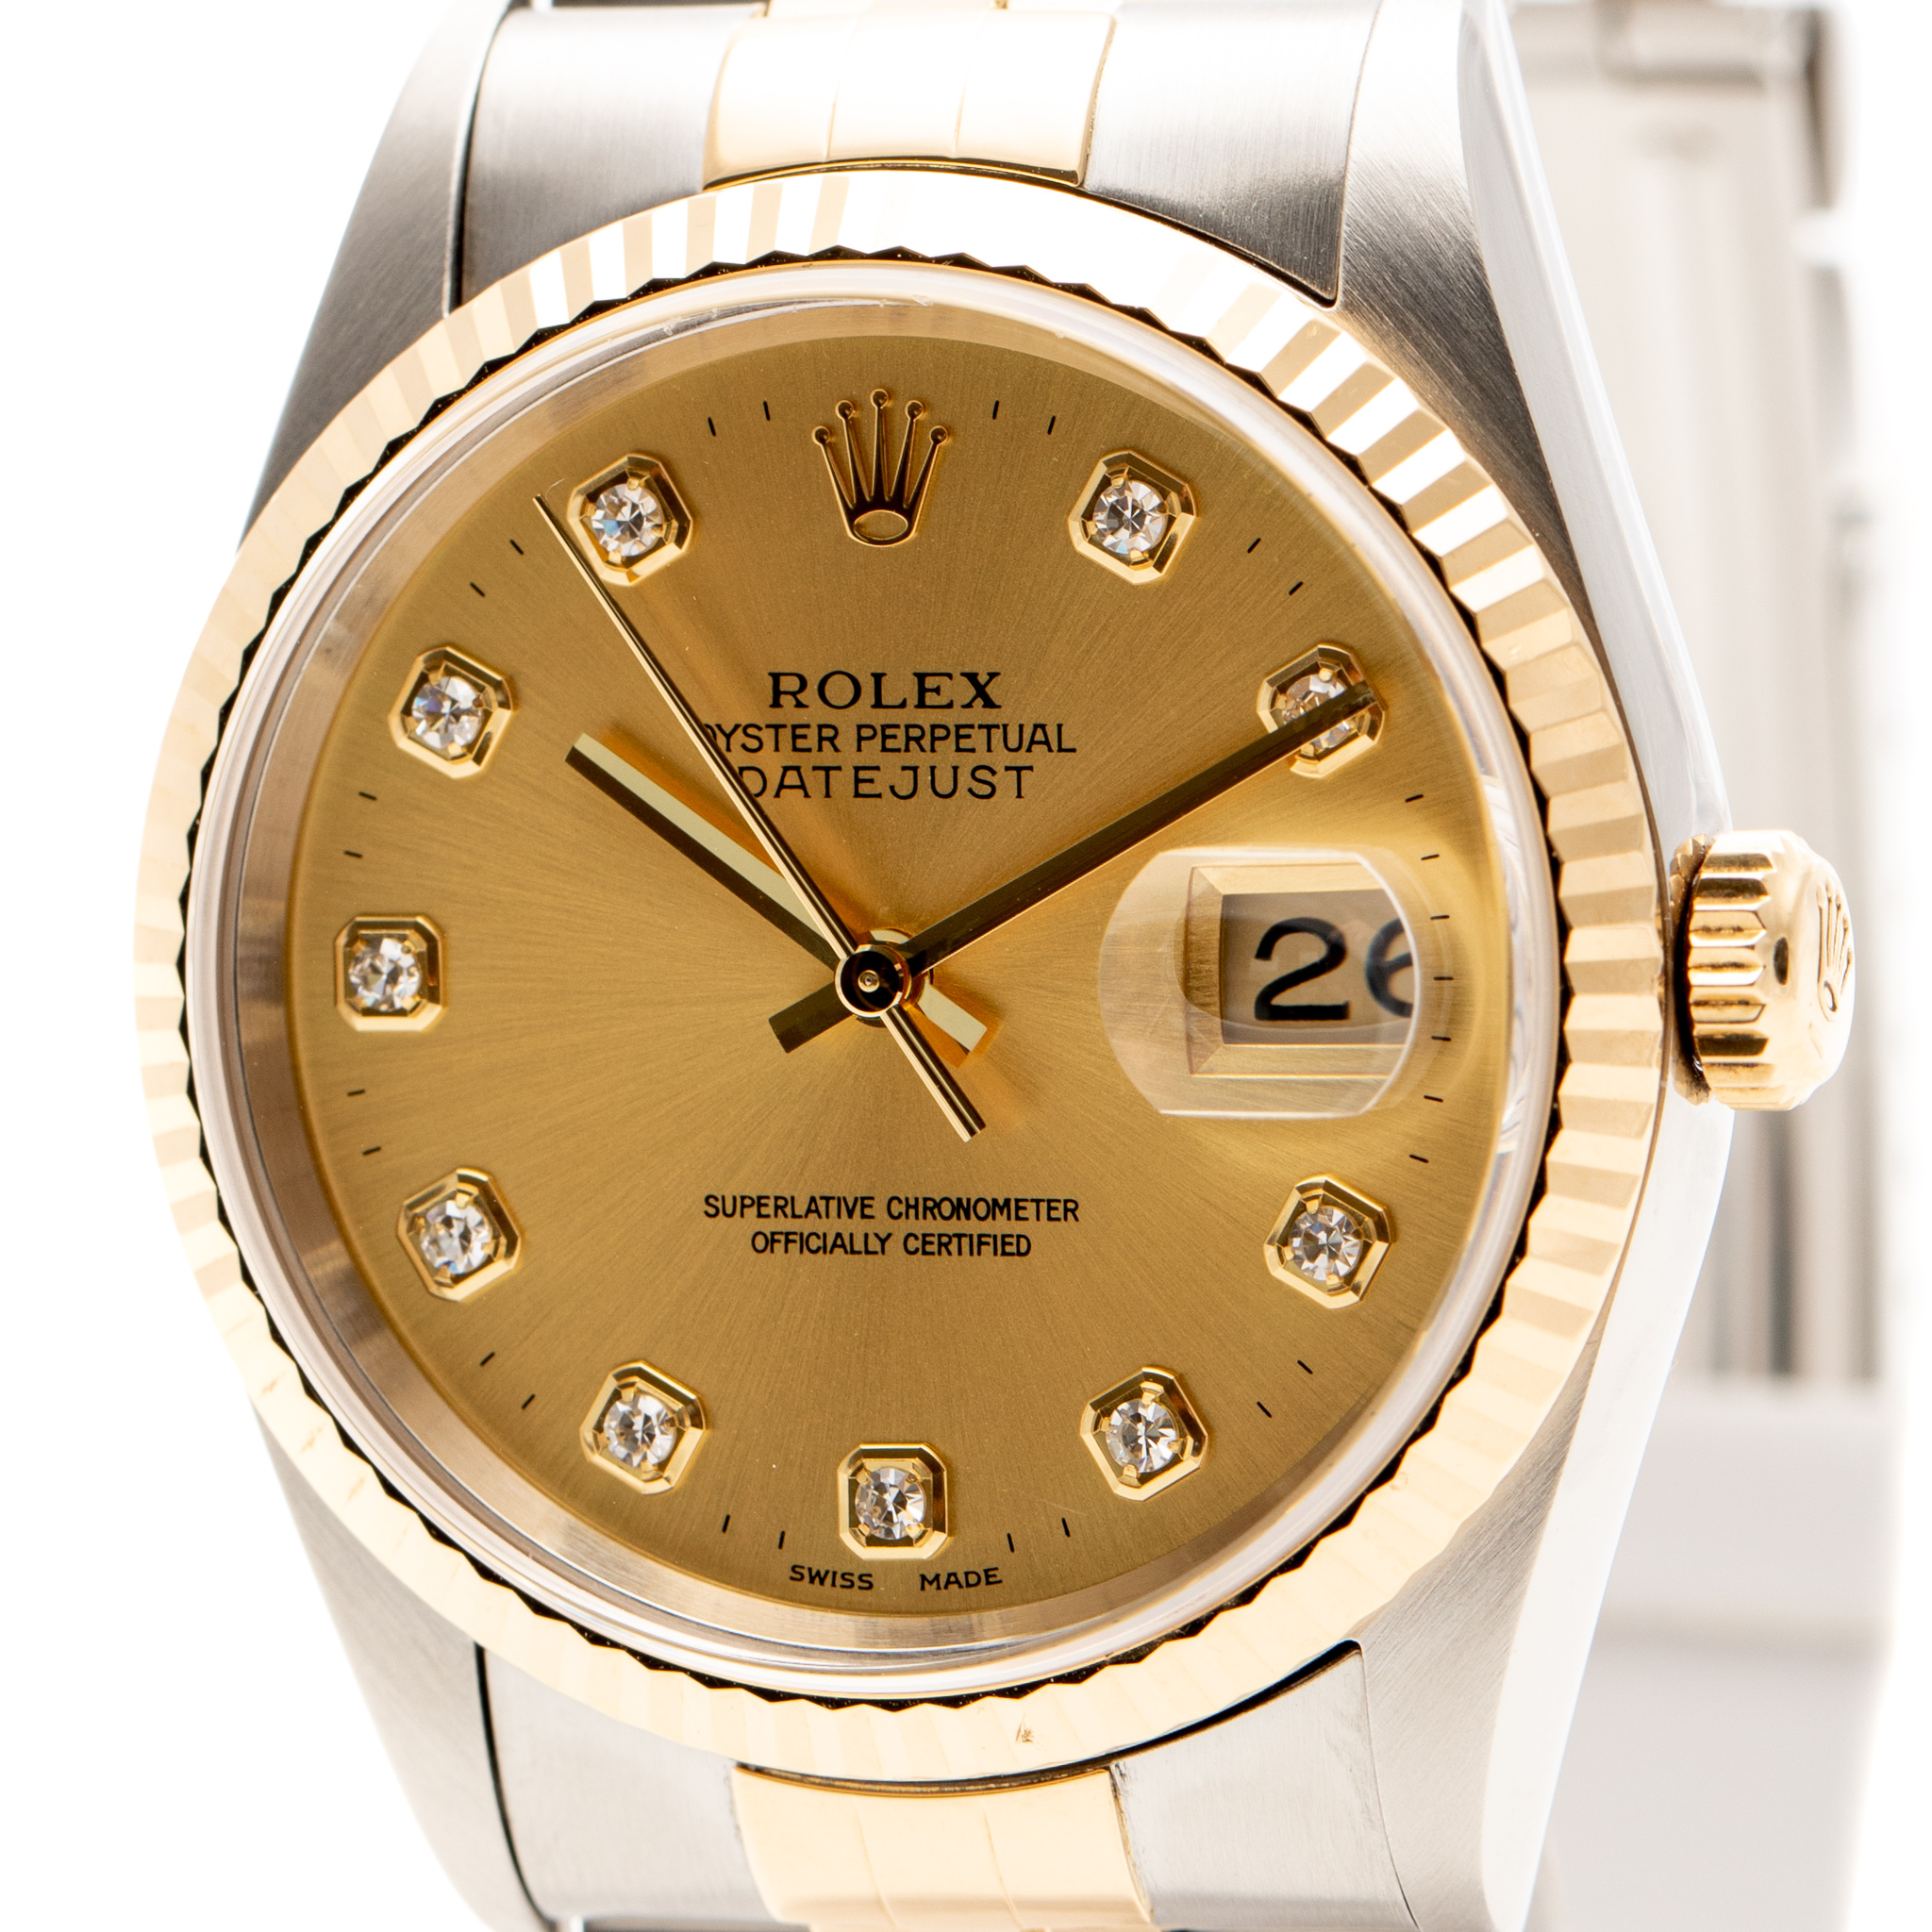 ROLEX DATEJUST 36MM GOLD&STEEL CHAMPAGNE DIAMOND DIAL REF: 16233